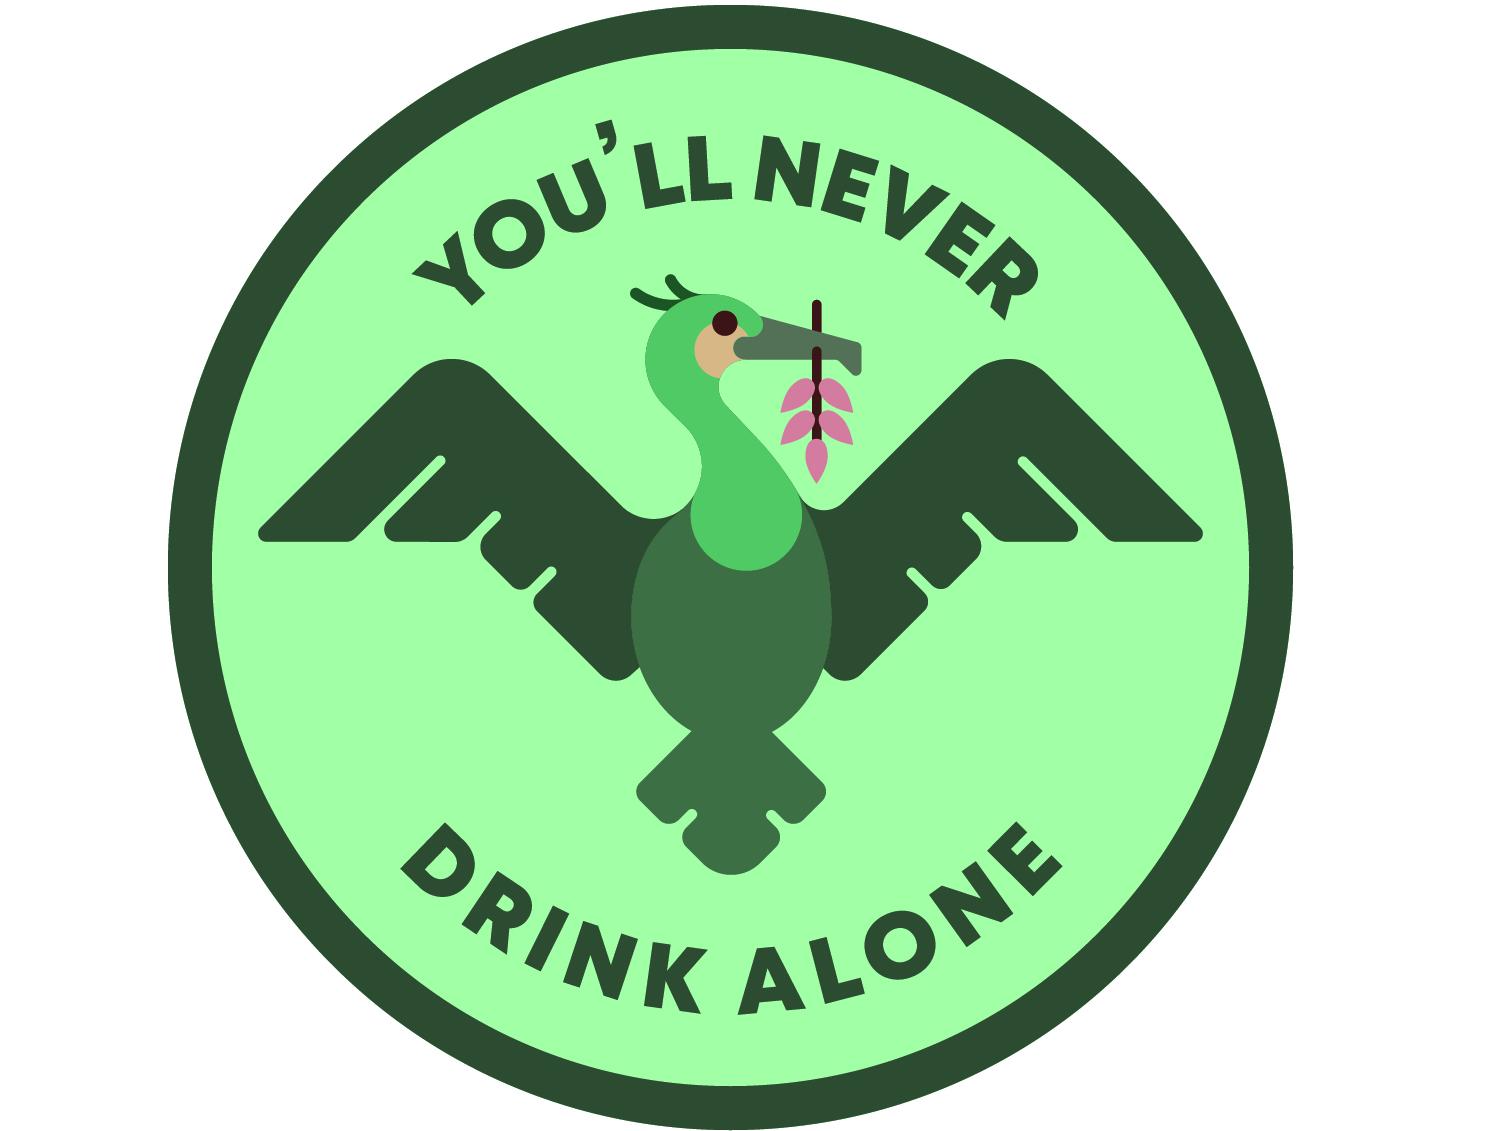 Liverbird Coaster bird illustration seaweed green cormorant coaster drink alone walk never youll liverbird bird liverpool fc liverpool vector illustration